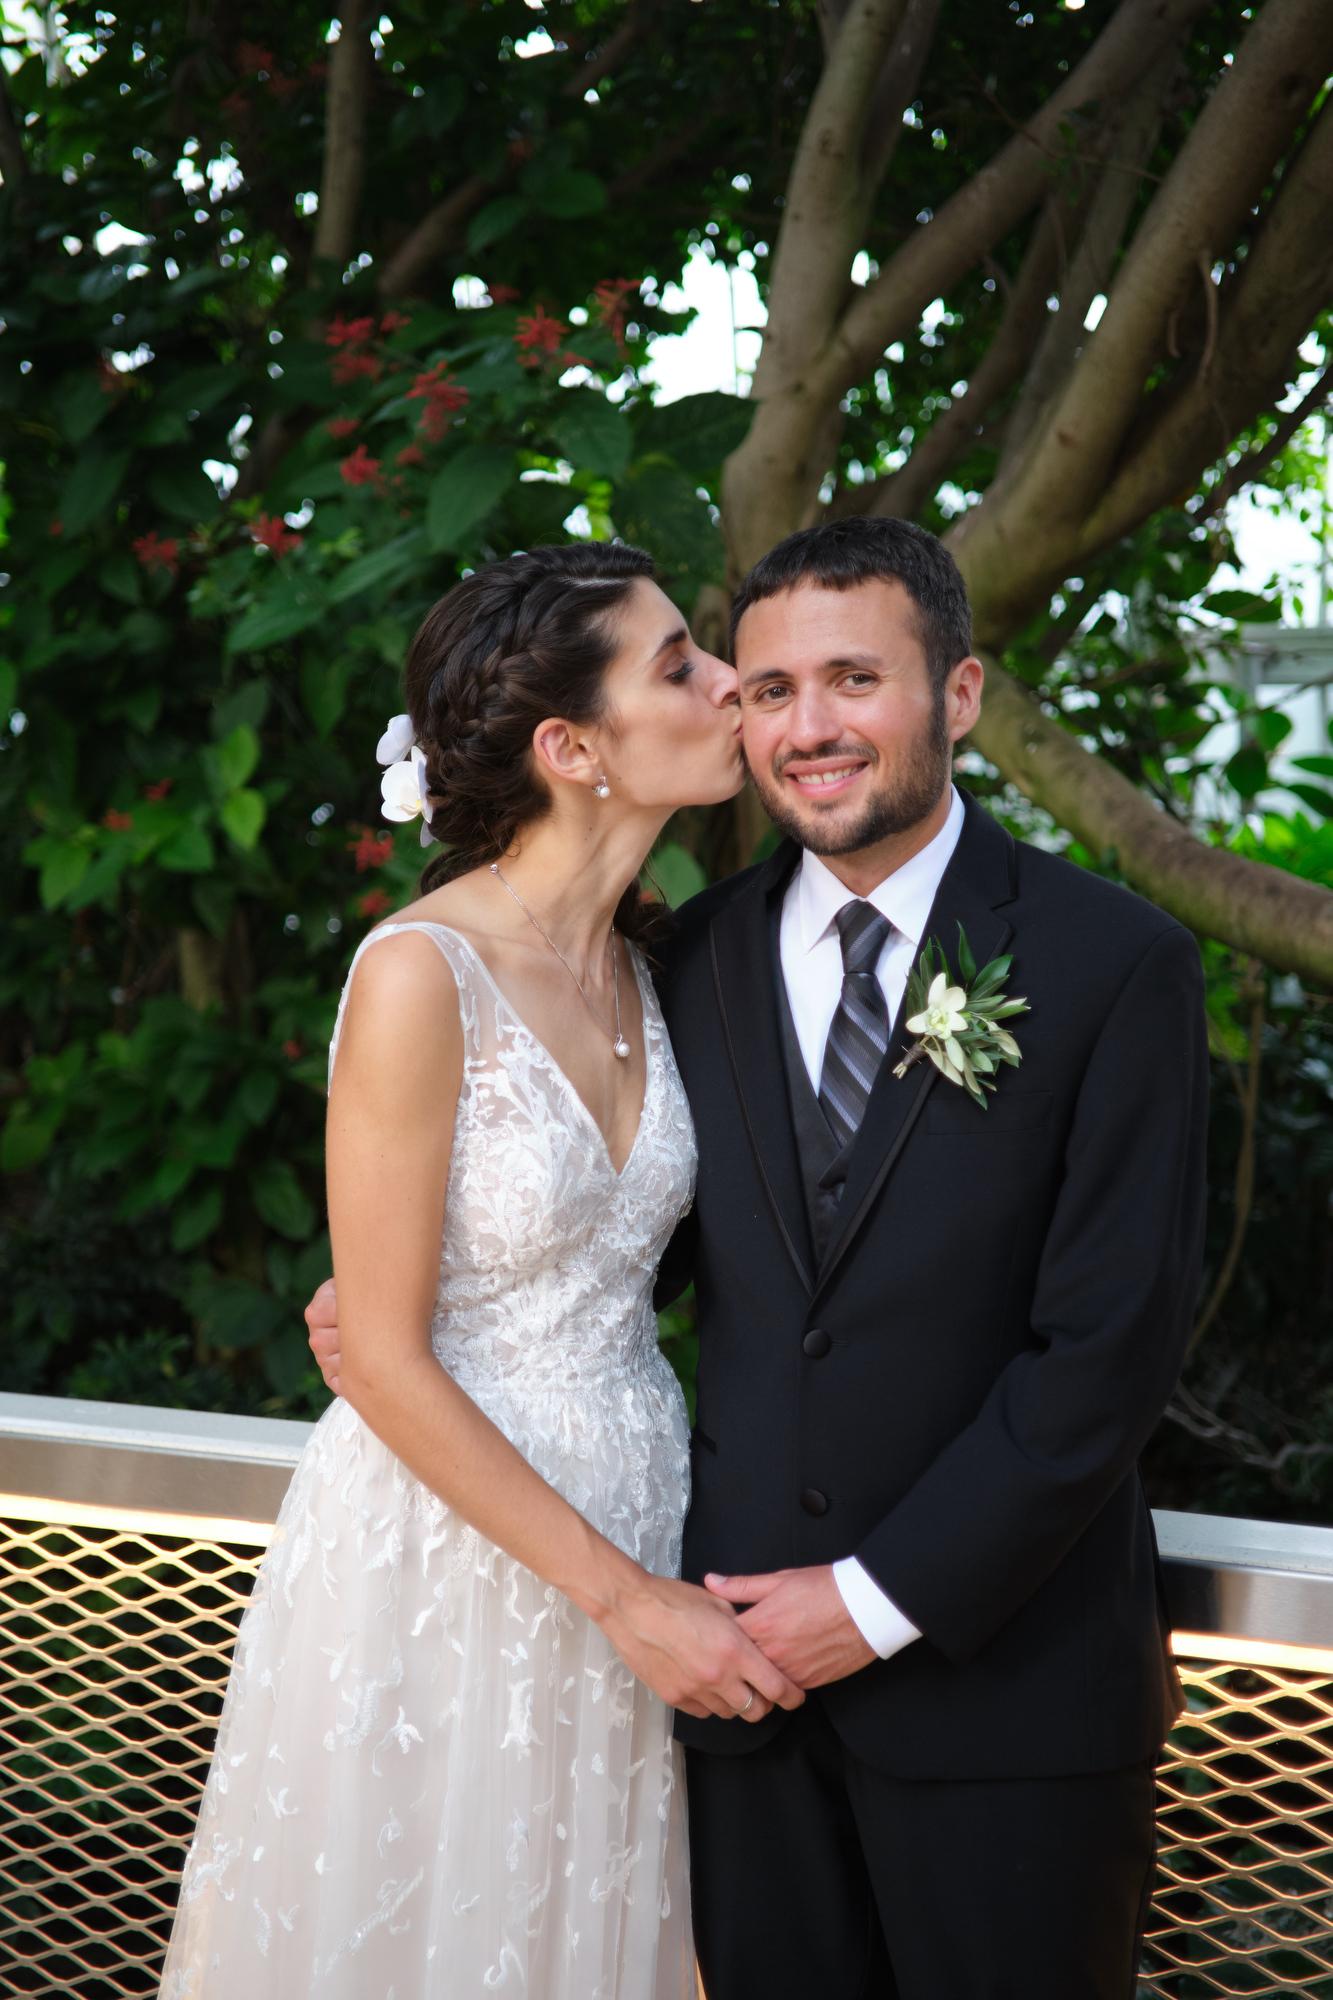 2019-07-20_18-36-00_FUJIFILM_X-T3_(c)-RH_weddingsbyryanandkate.com.JPG